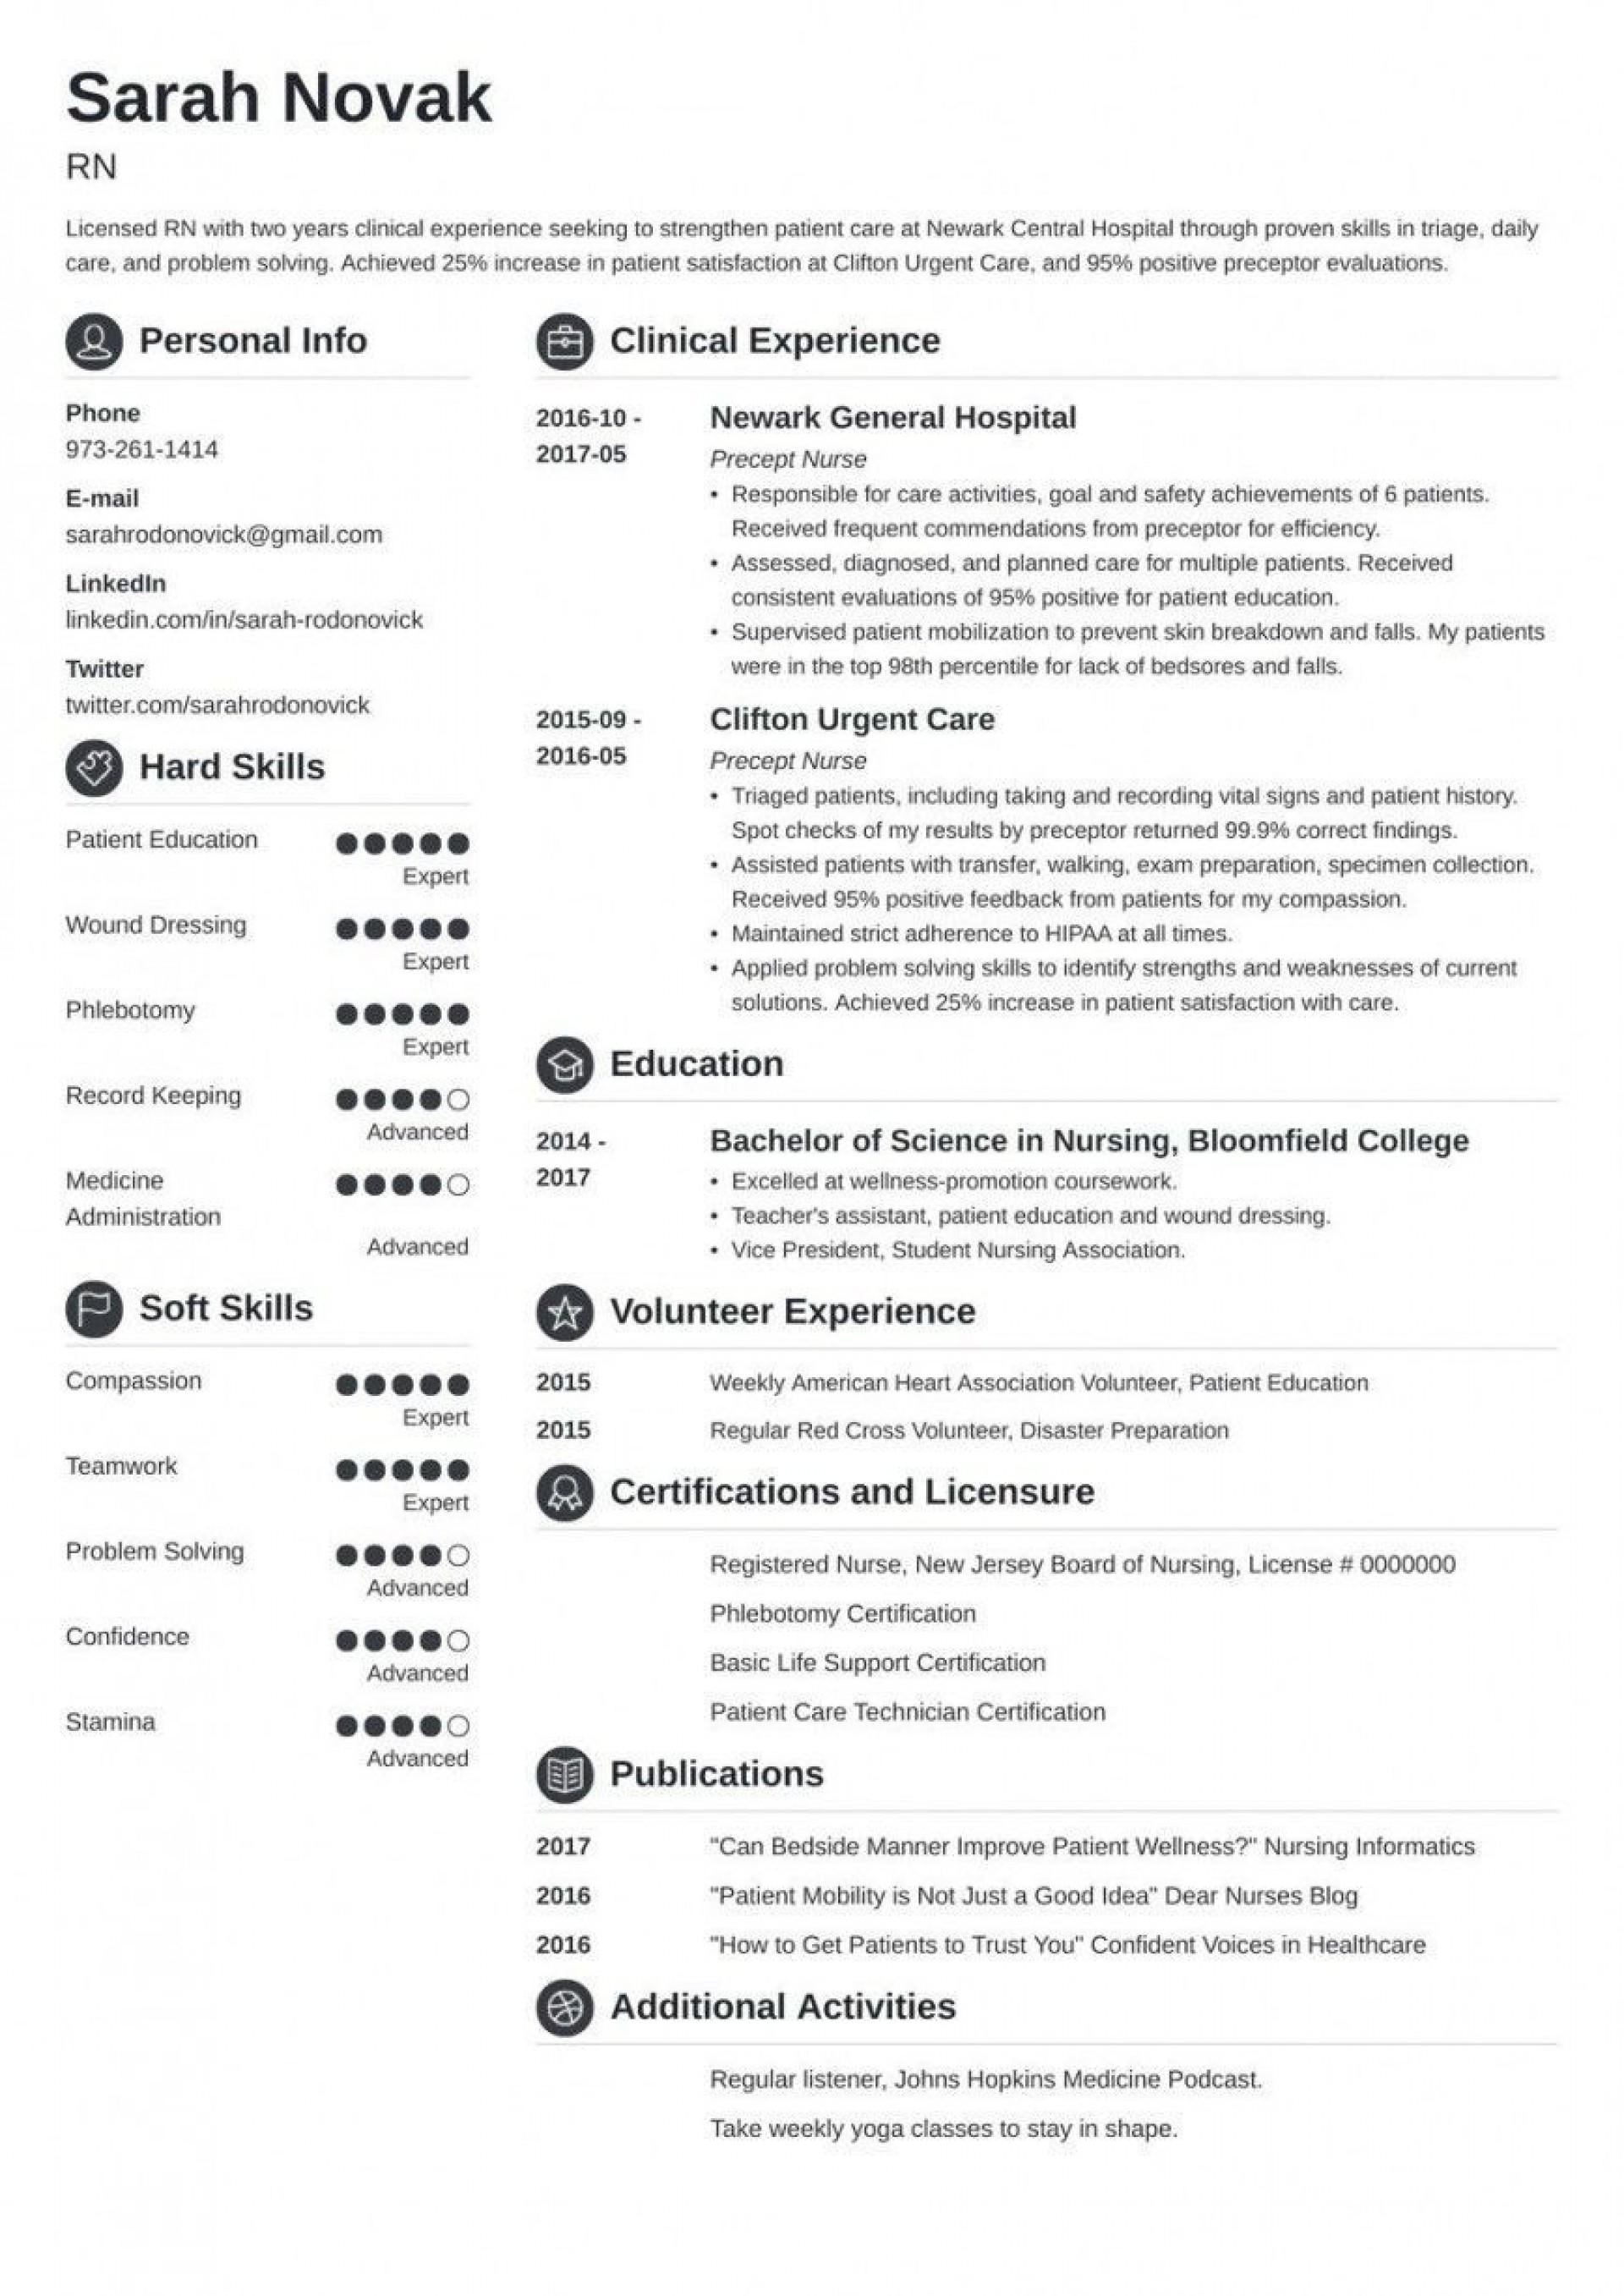 003 Unique New Rn Resume Template Sample 1920